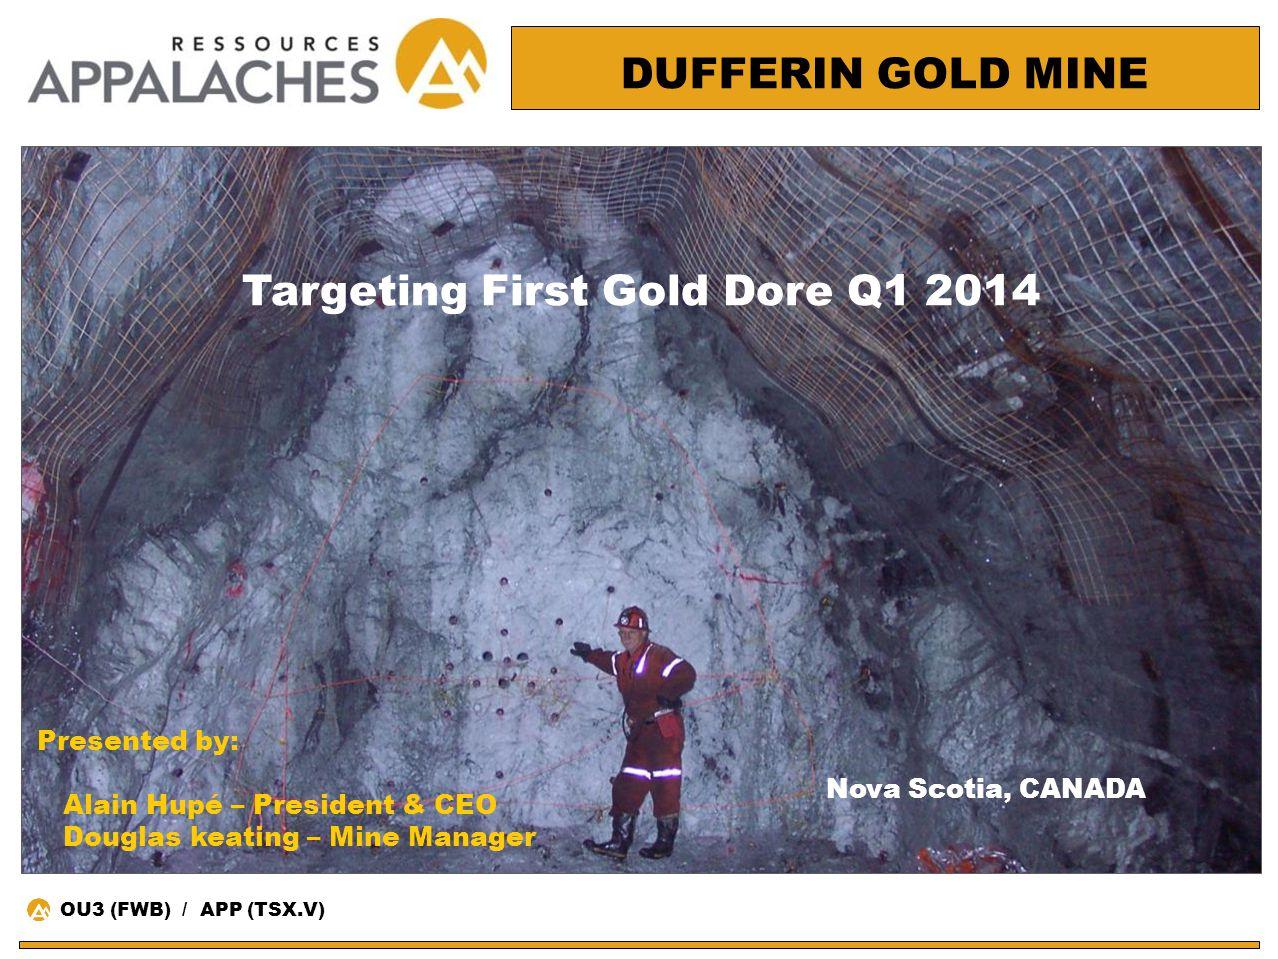 Nova Scotia, CANADA DUFFERIN GOLD MINE Targeting First Gold Dore Q1 2014 OU3 (FWB) / APP (TSX.V) Presented by: Alain Hupé – President & CEO Douglas ke